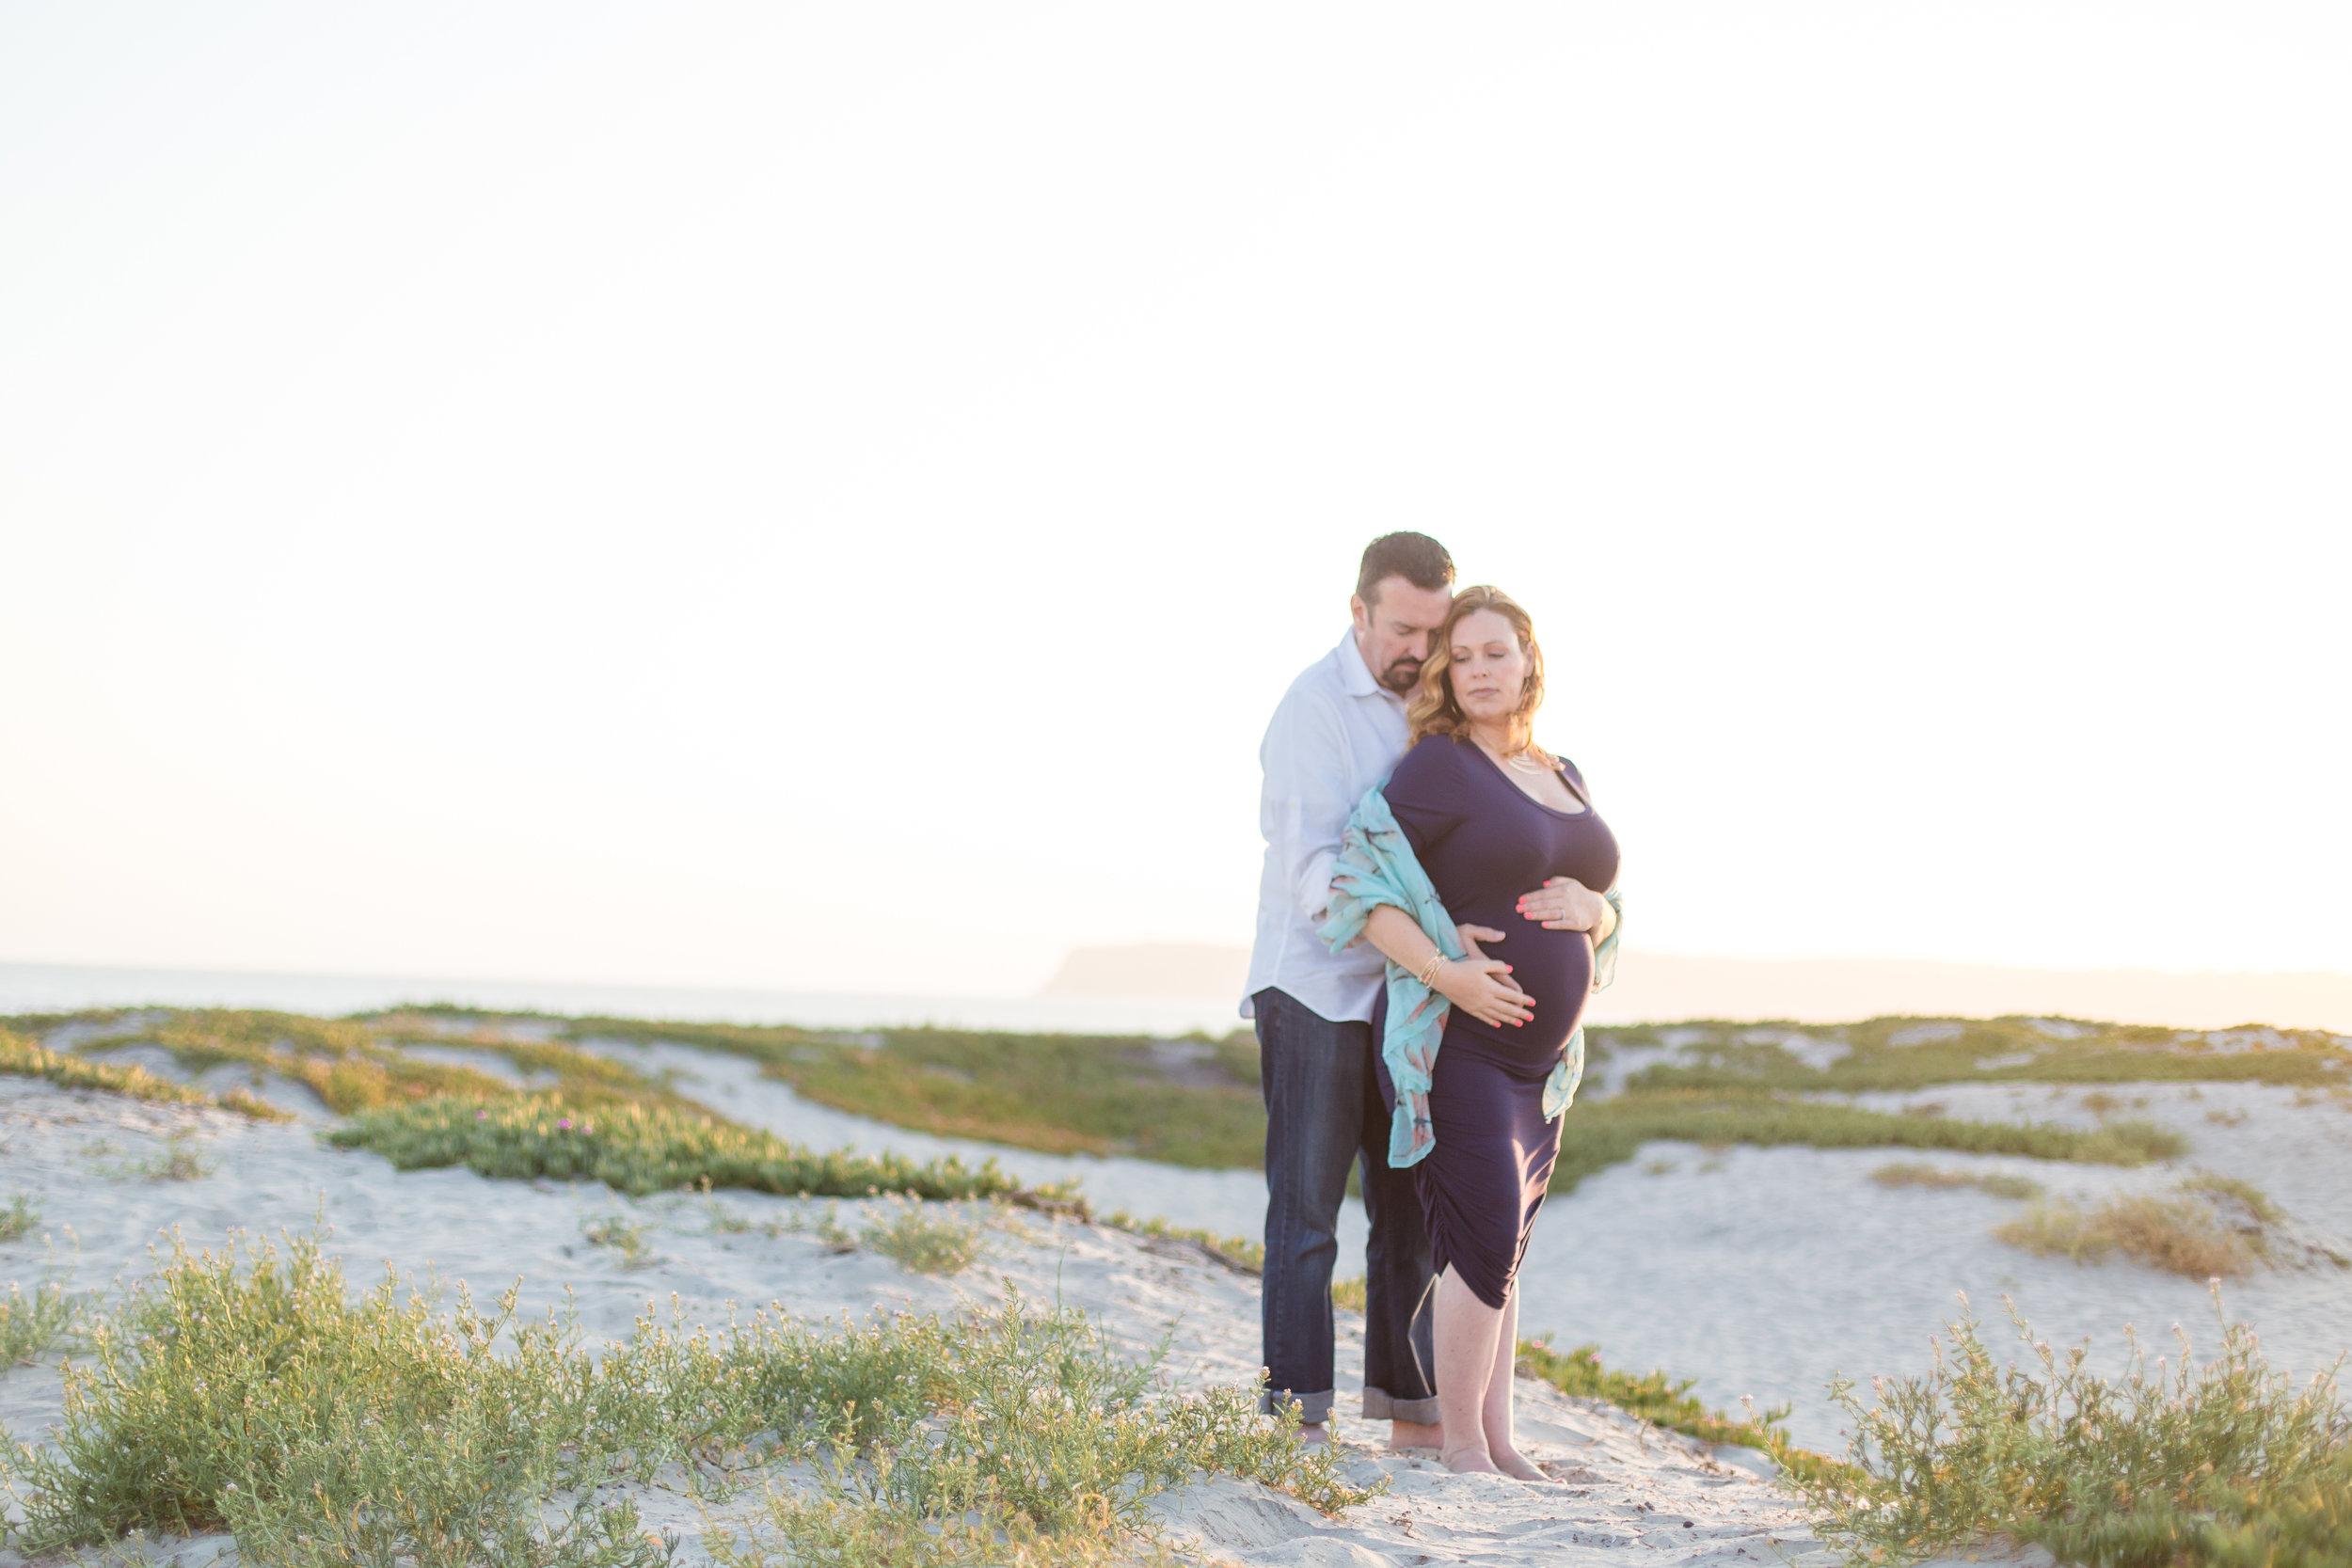 Coronado Beach Maternity Session | Spring 2016